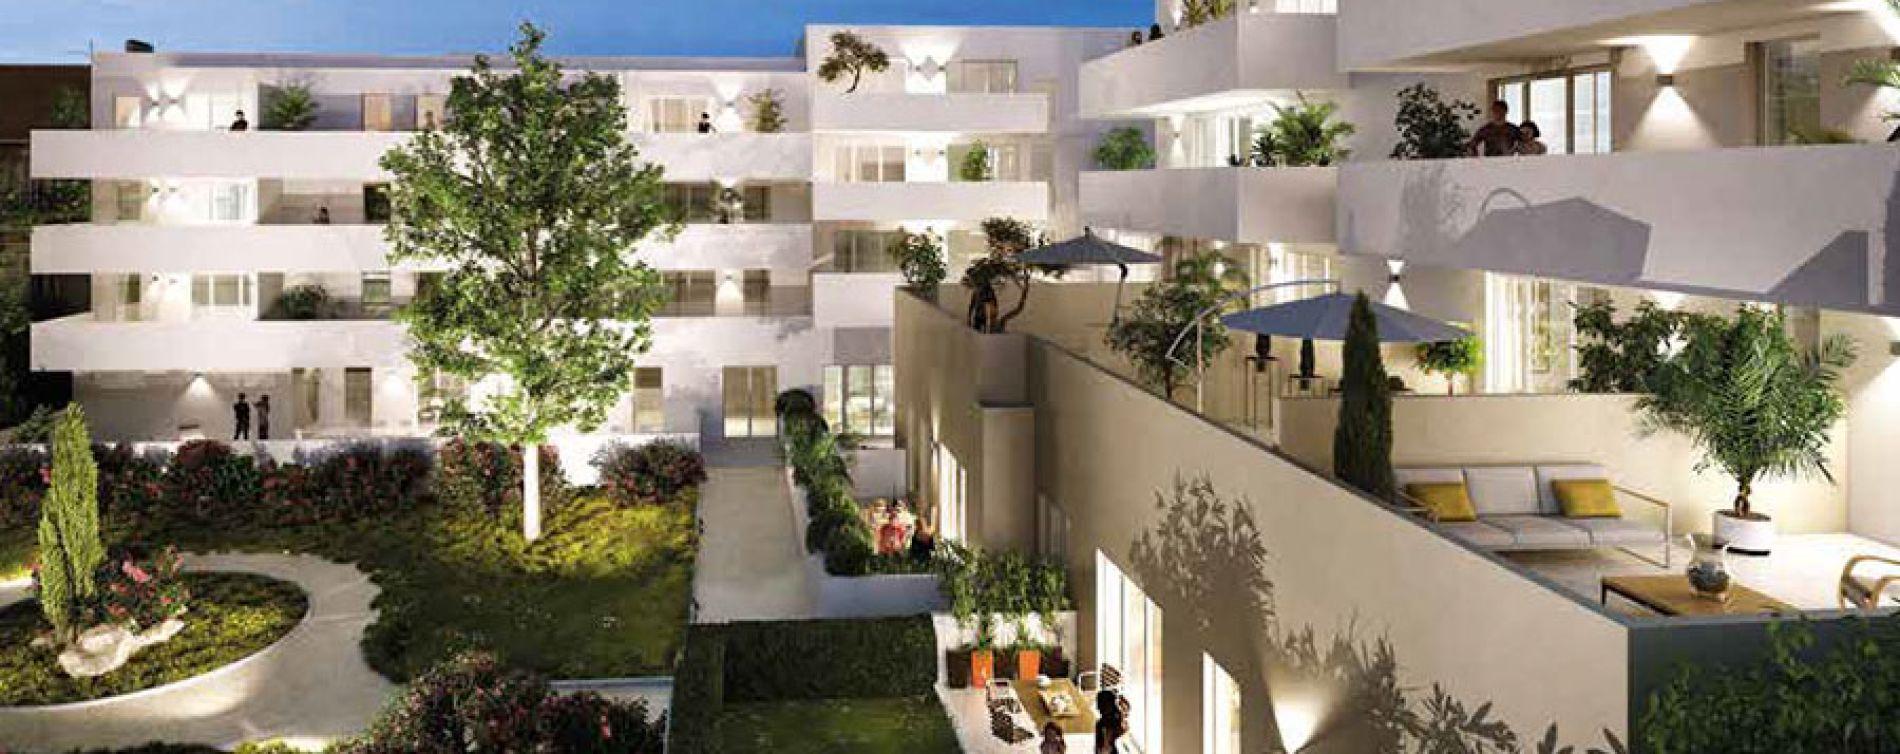 Résidence Villa Rolland à Marseille